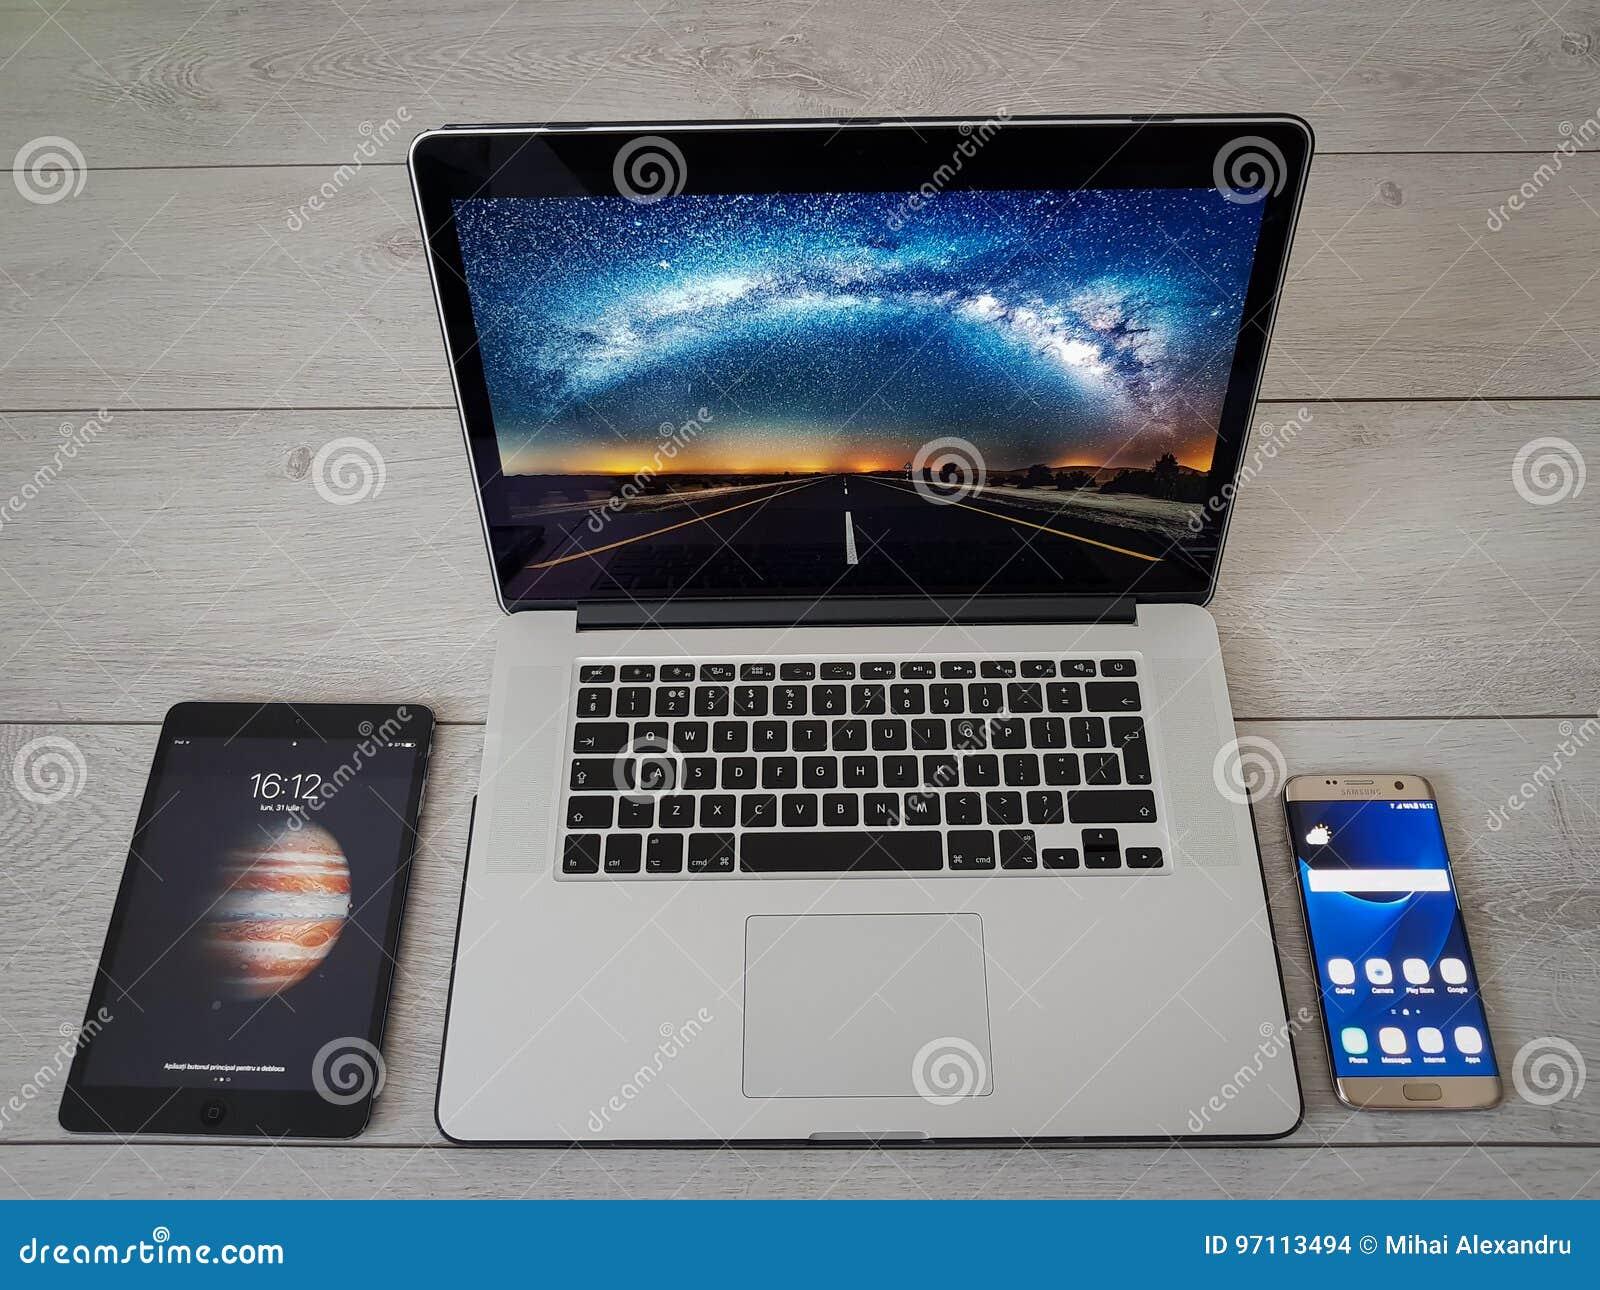 Modern Devices Smartphone IPad Laptop Grey Background